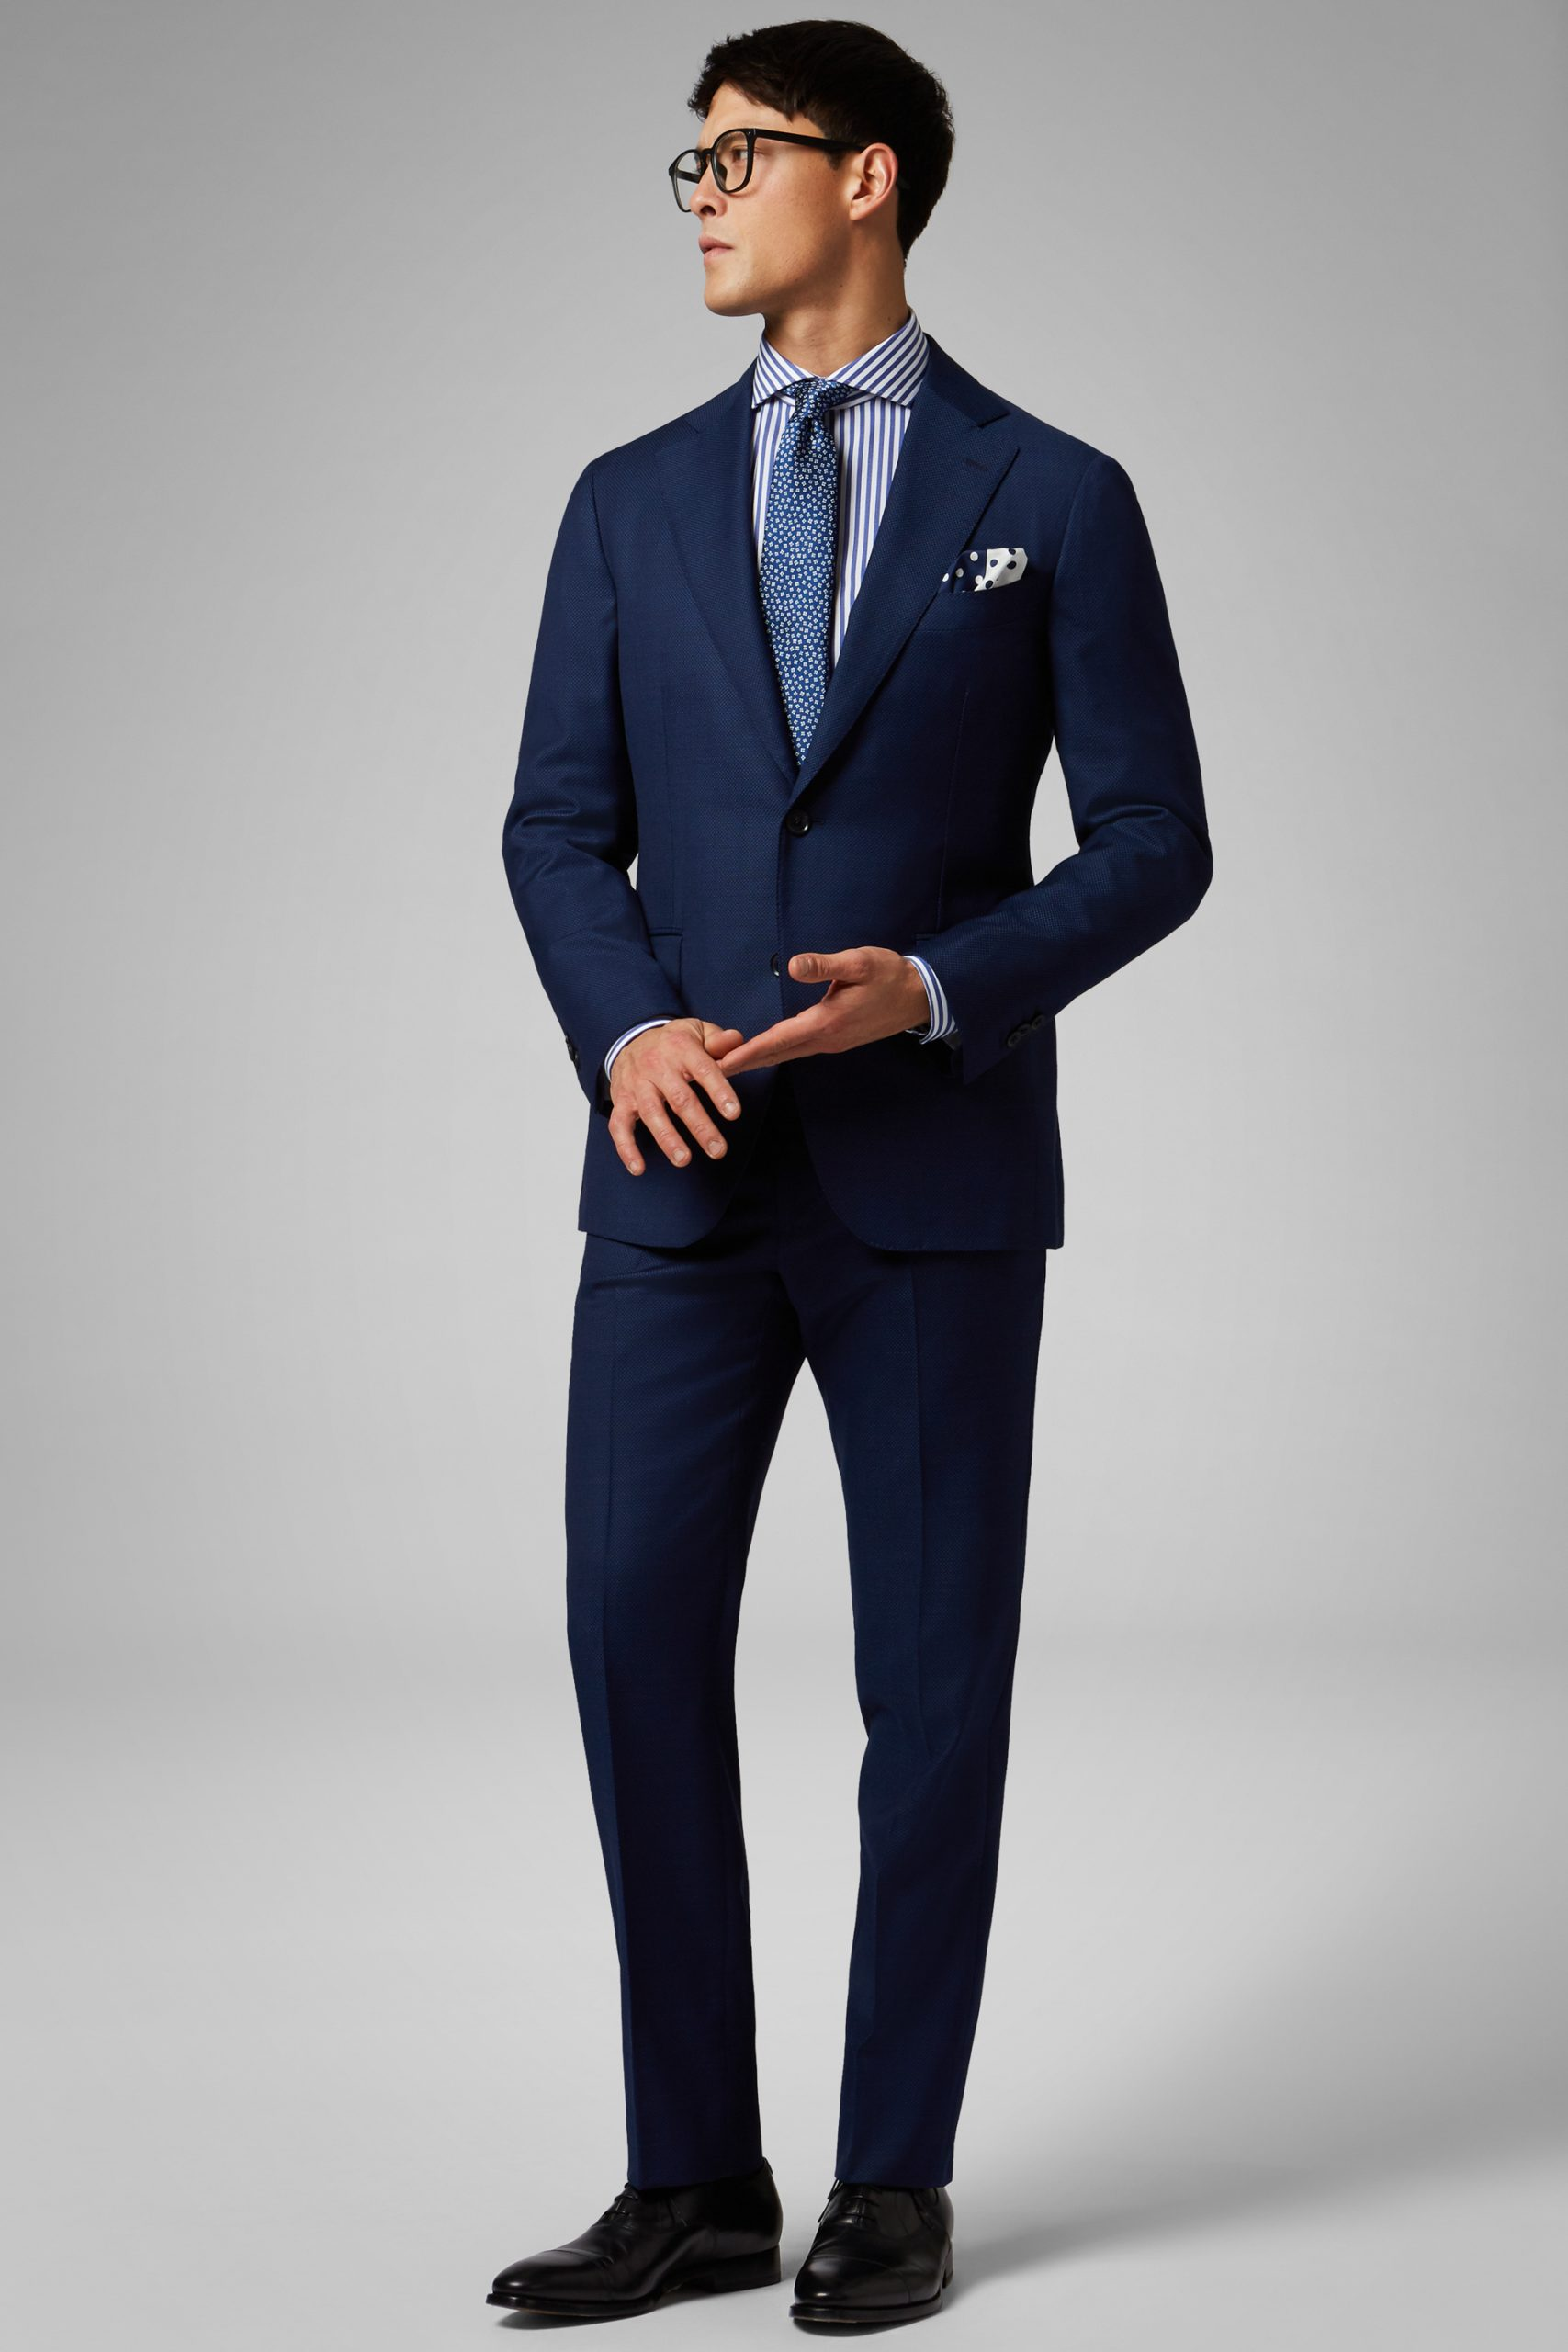 Abiti da uomo in colore Blu in materiale